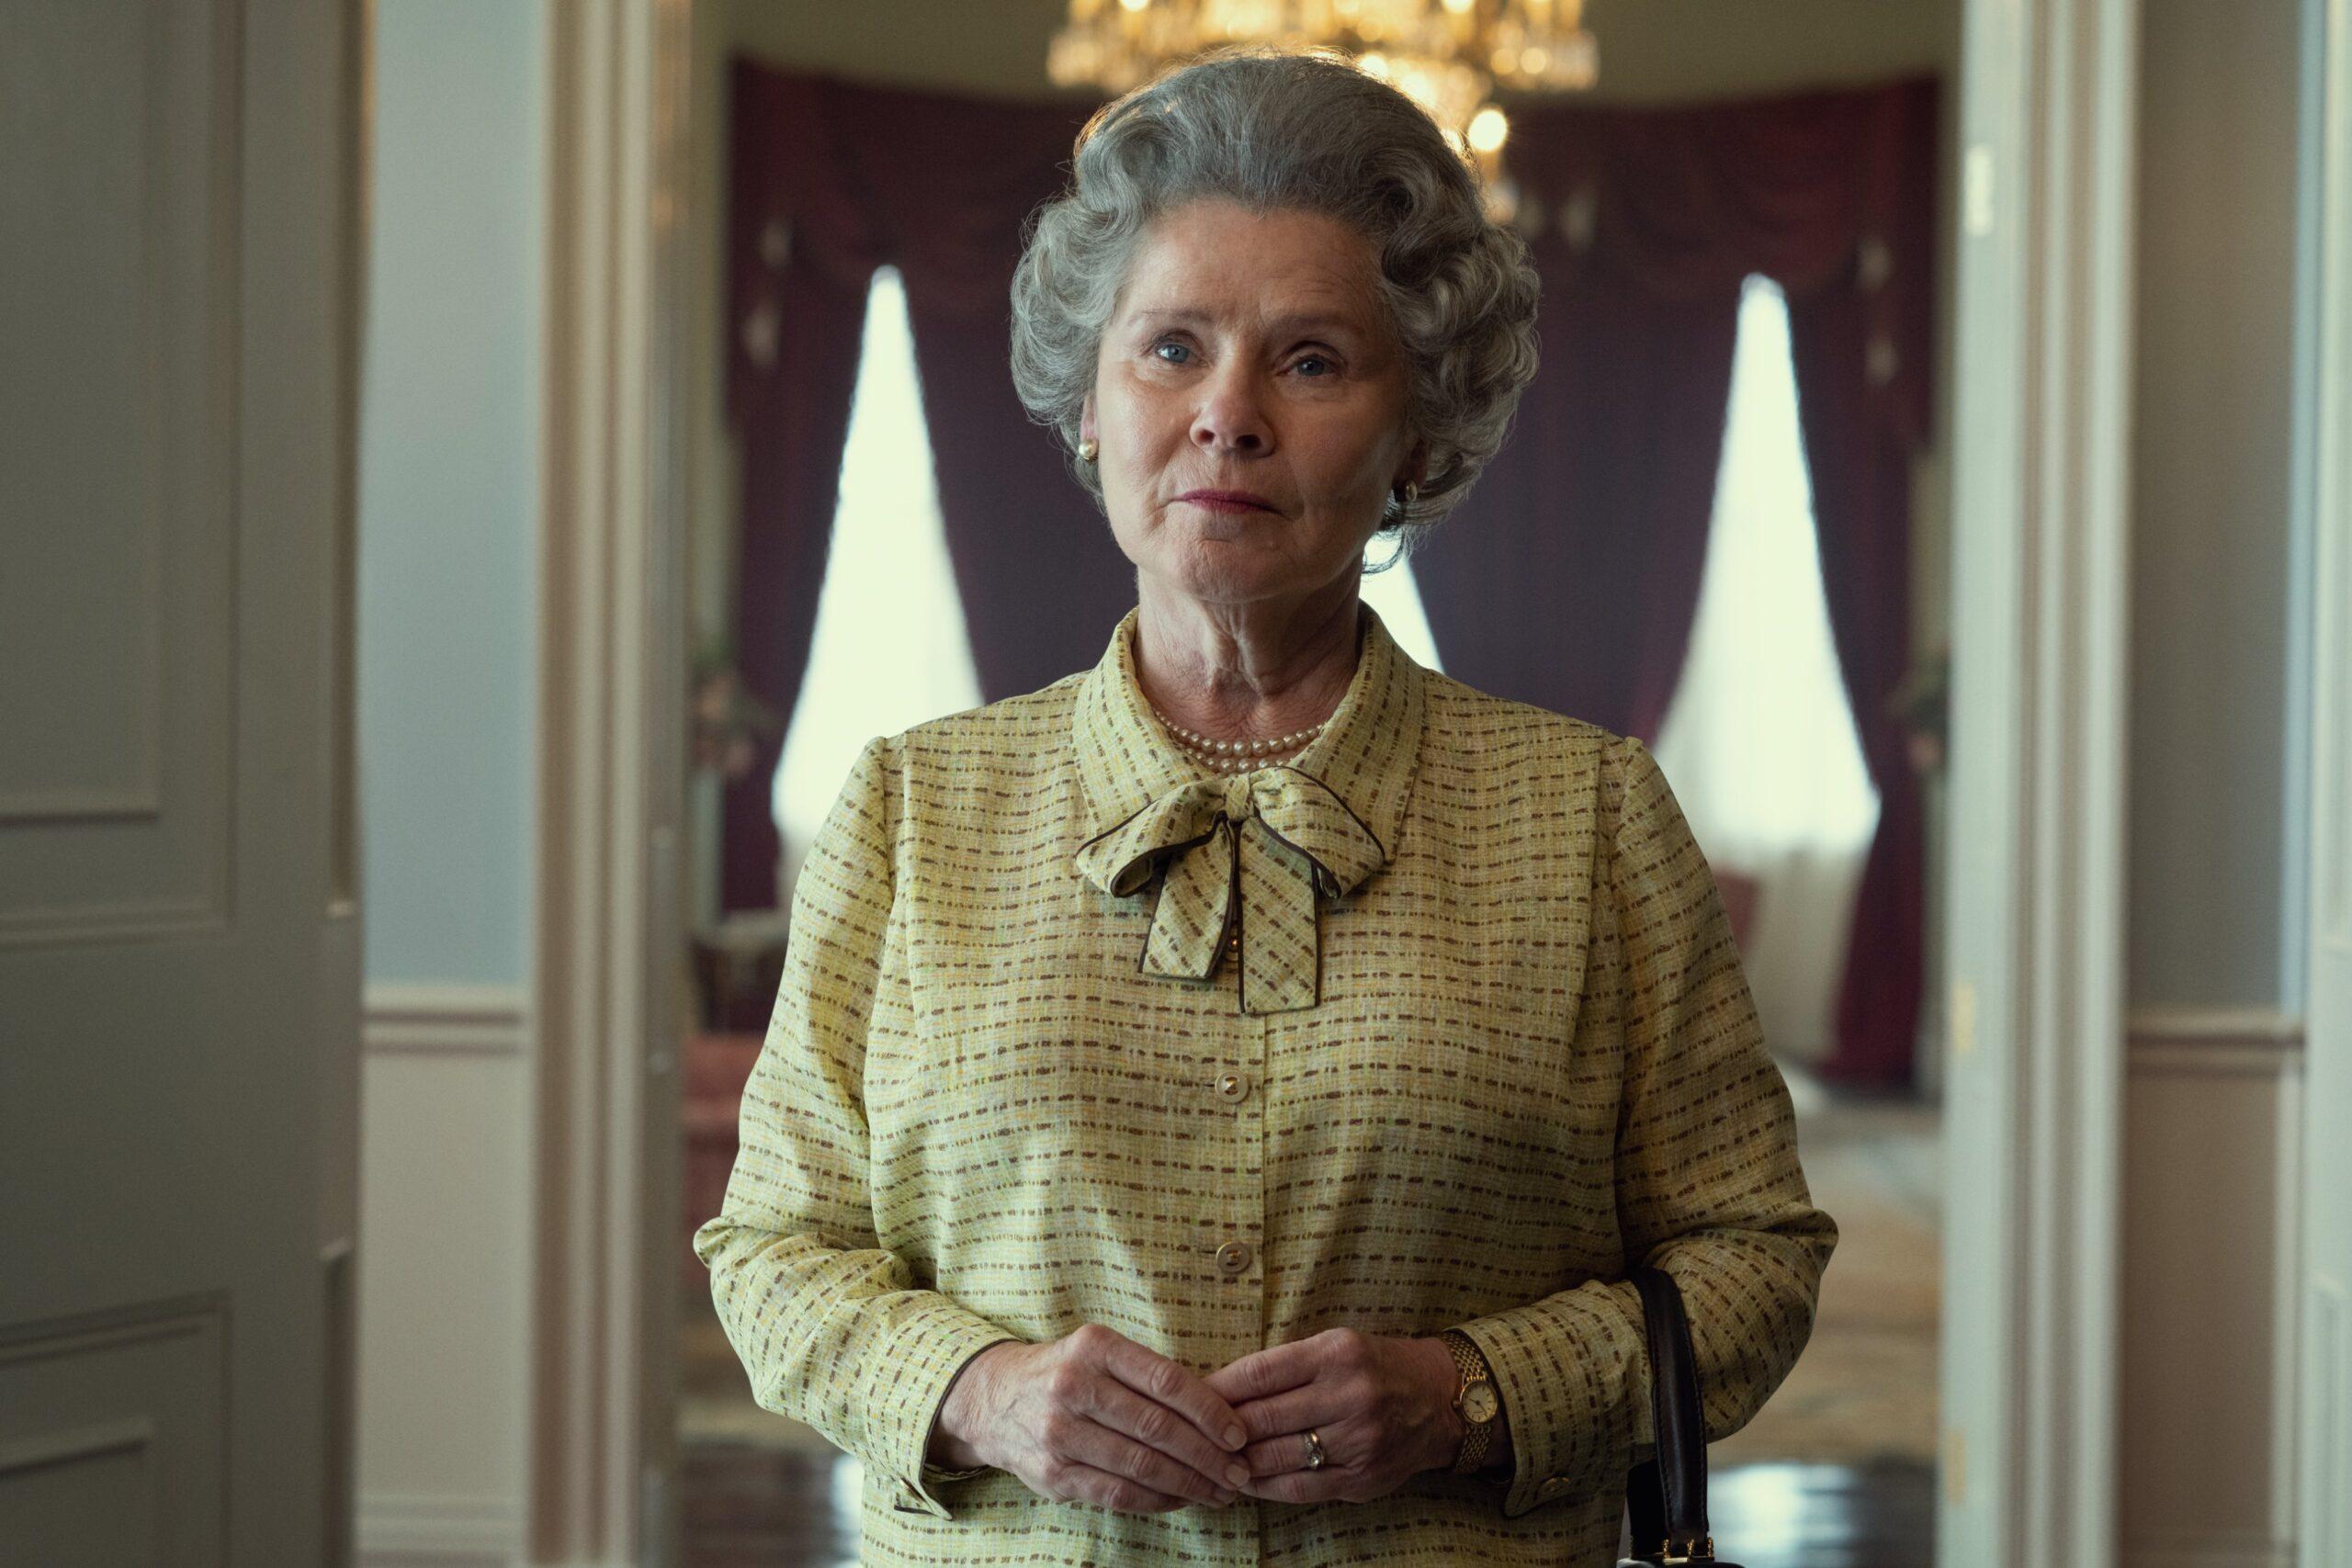 Primera imagen de Imelda Staunton como la reina en 'The Crown' • En tu pantalla